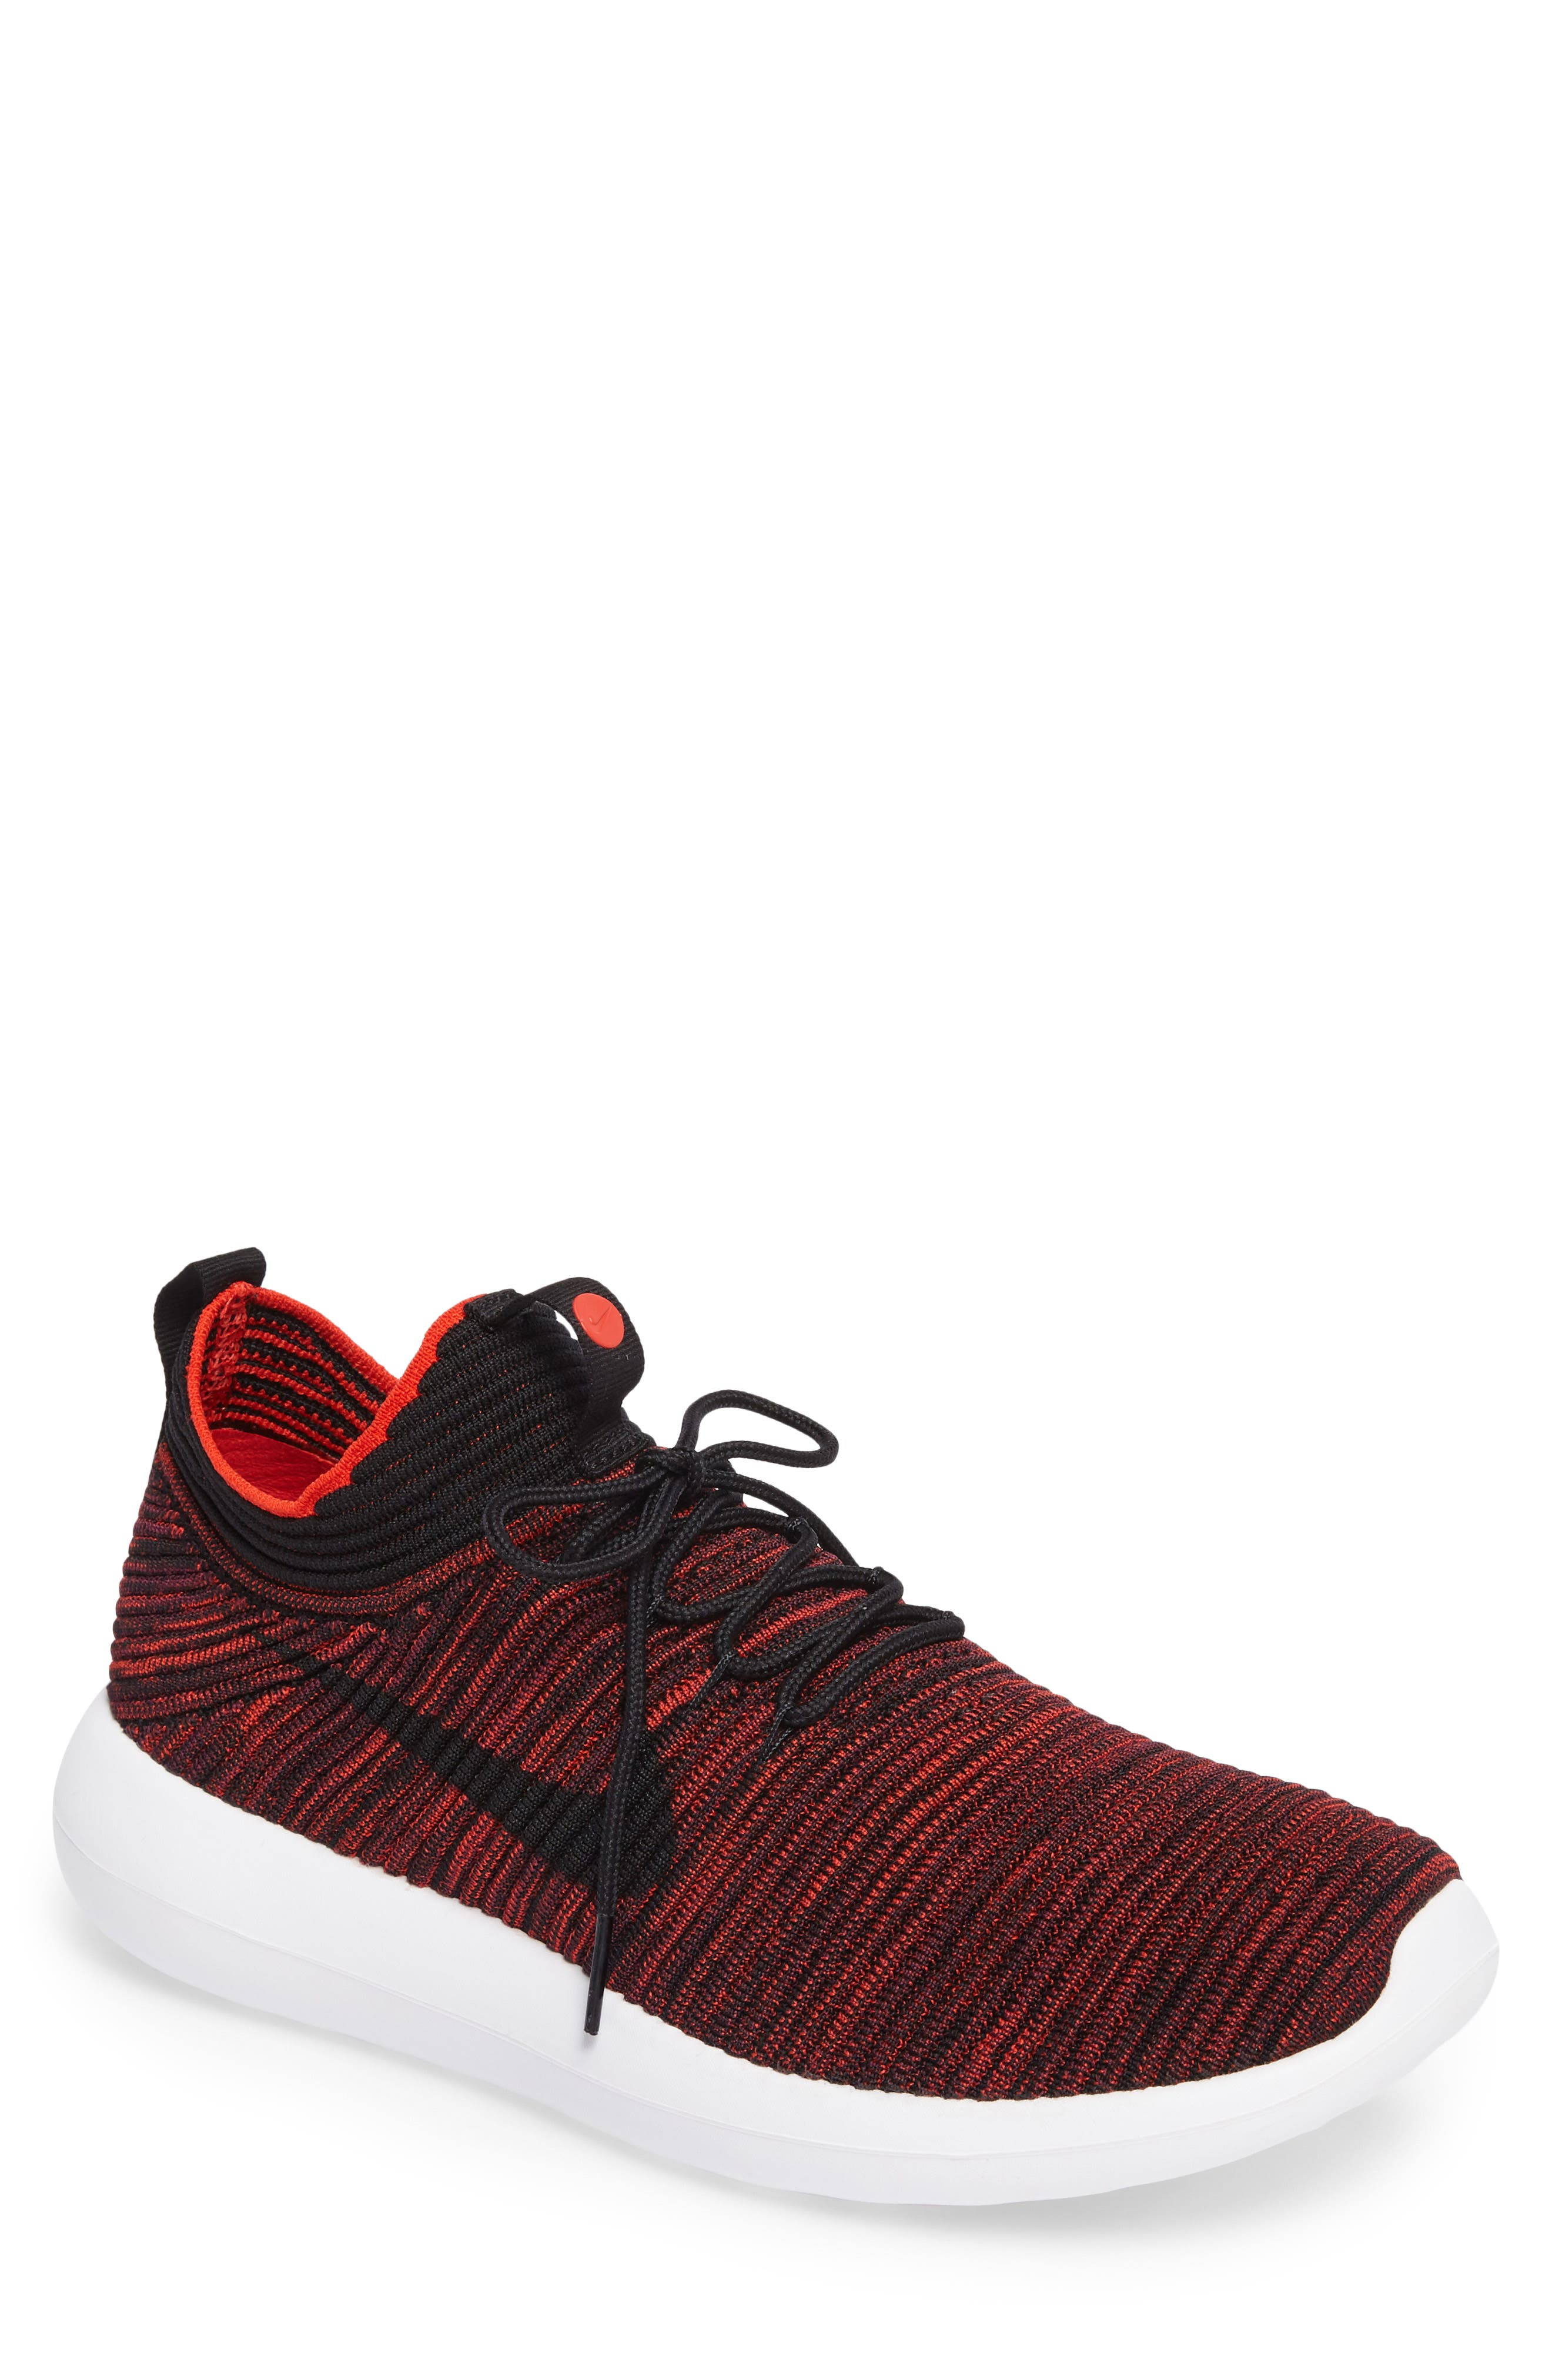 Roshe Two Flyknit V2 Sneaker,                             Main thumbnail 1, color,                             Chile Red/ Black